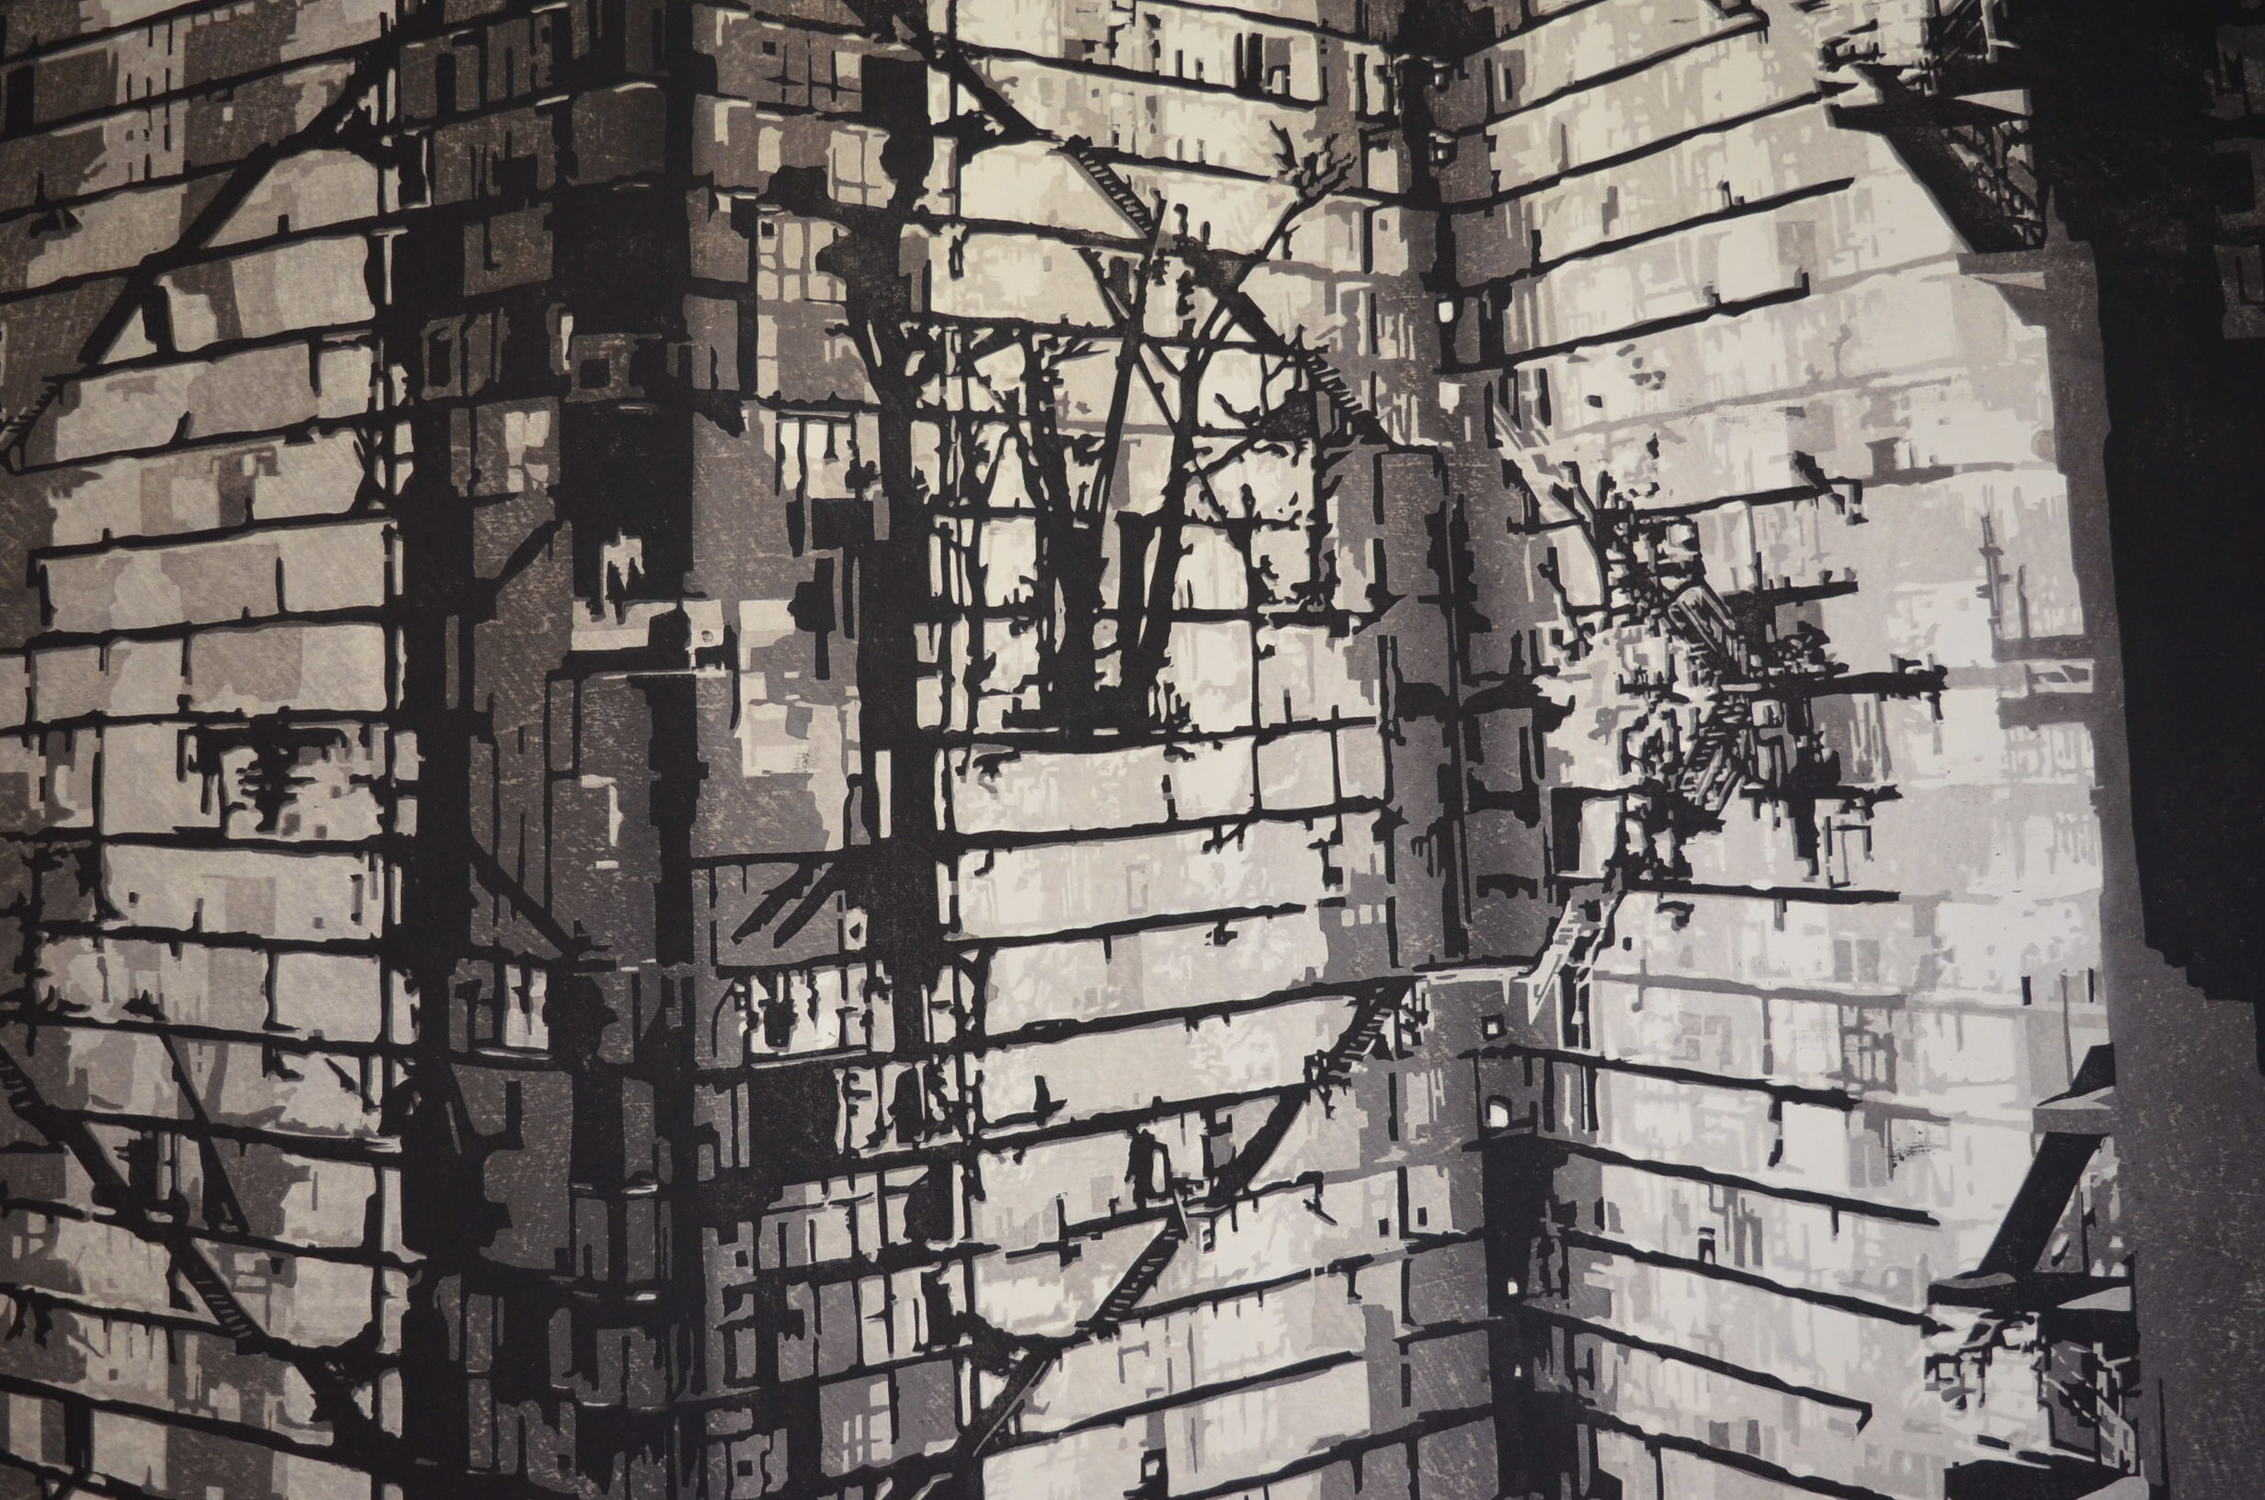 NARUMI KATSURAGAWA: #P4619 OVER AGAIN (detail)